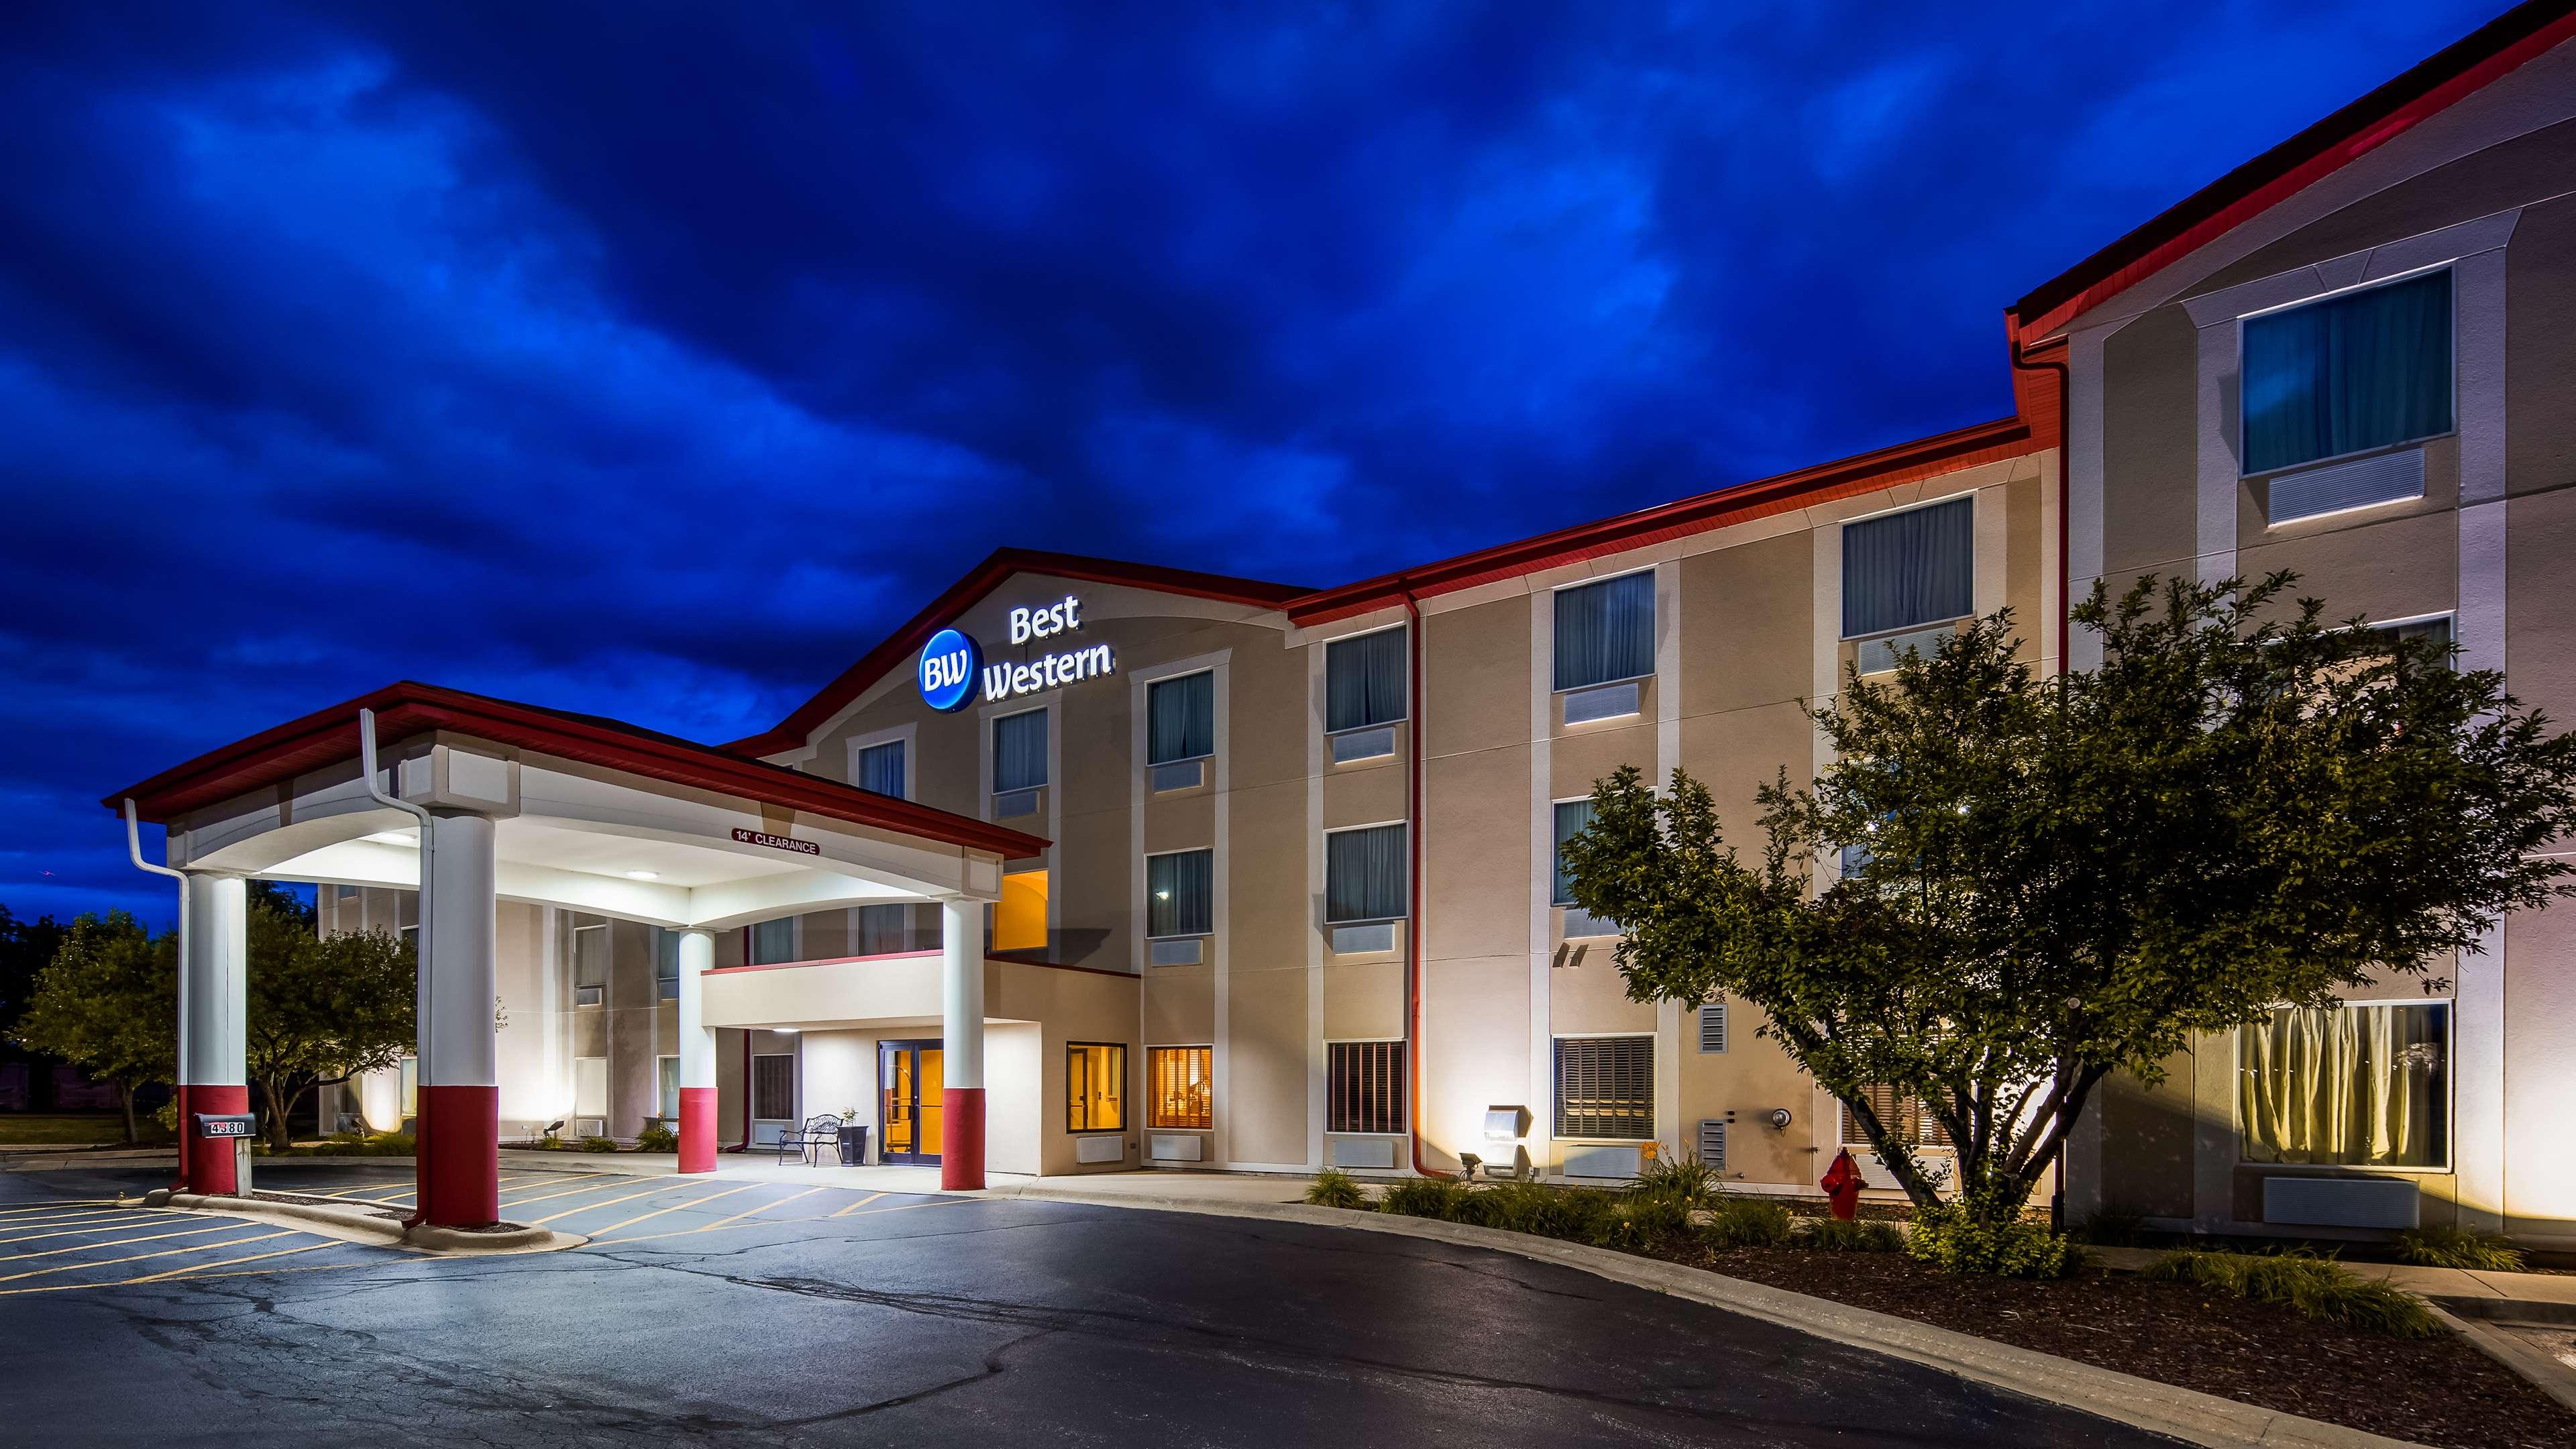 Best Western Joliet Inn & Suites image 0